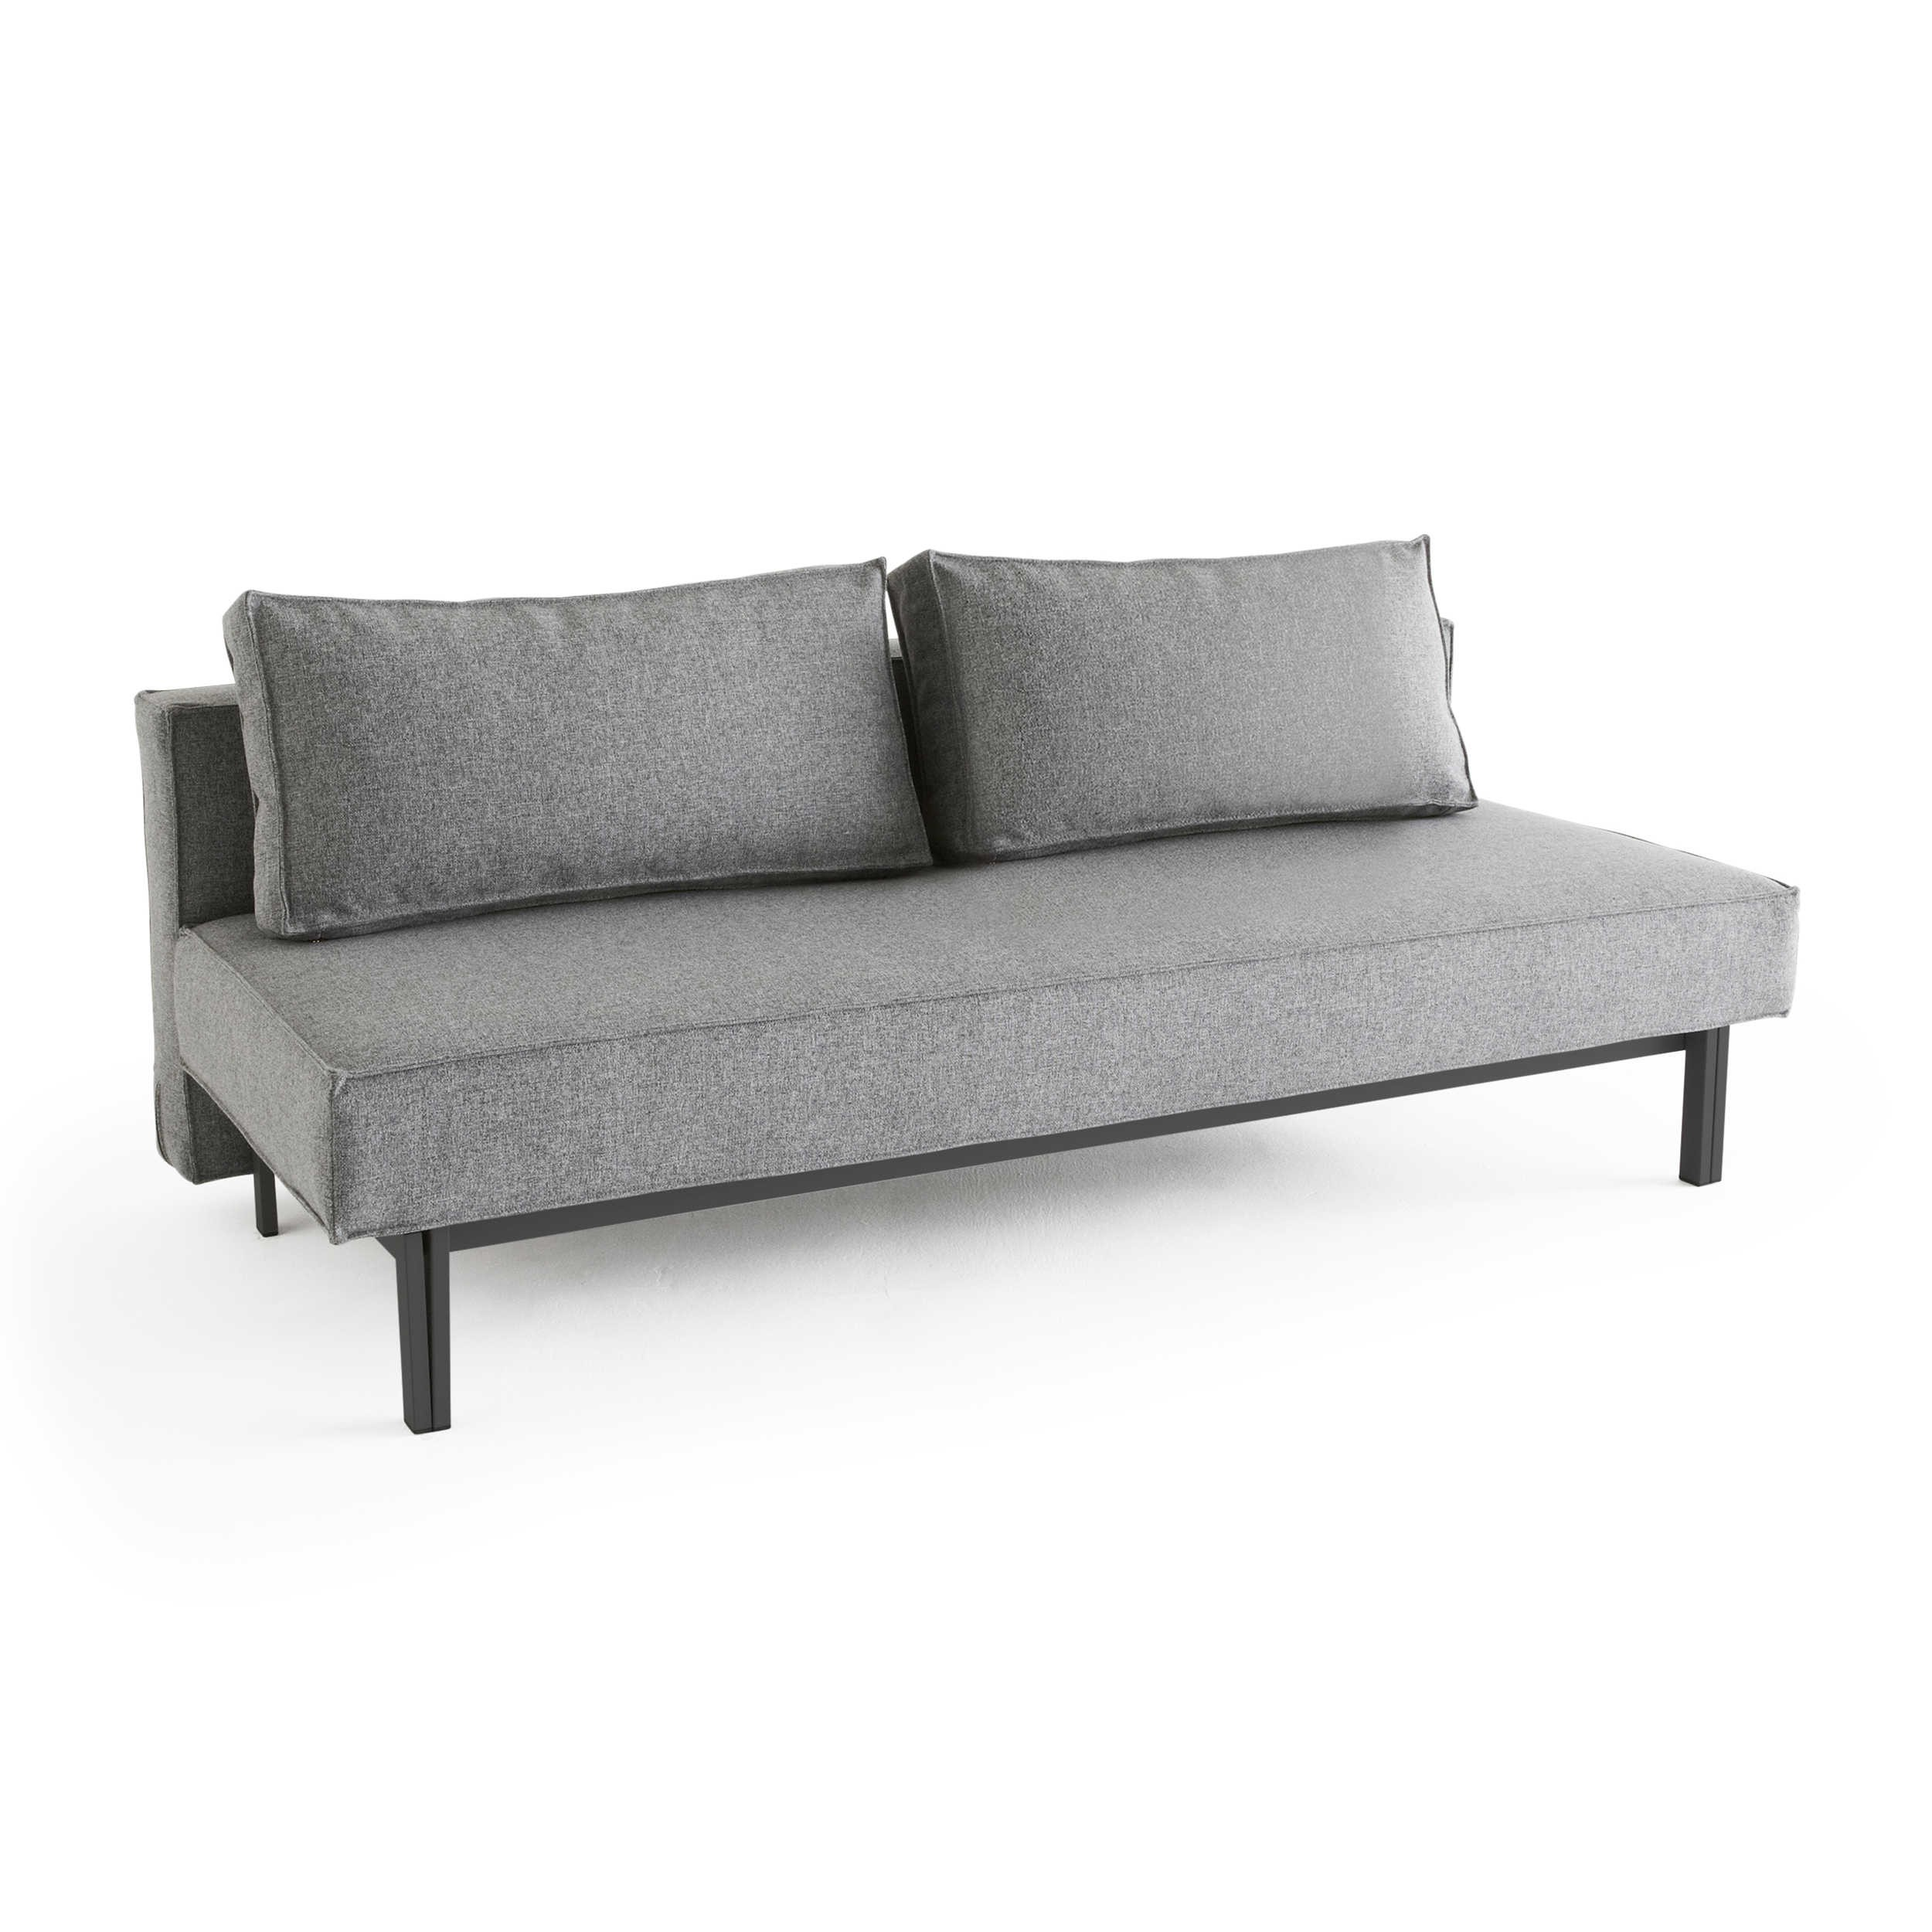 innovation schlafsofa sly grau stoff online kaufen bei woonio. Black Bedroom Furniture Sets. Home Design Ideas